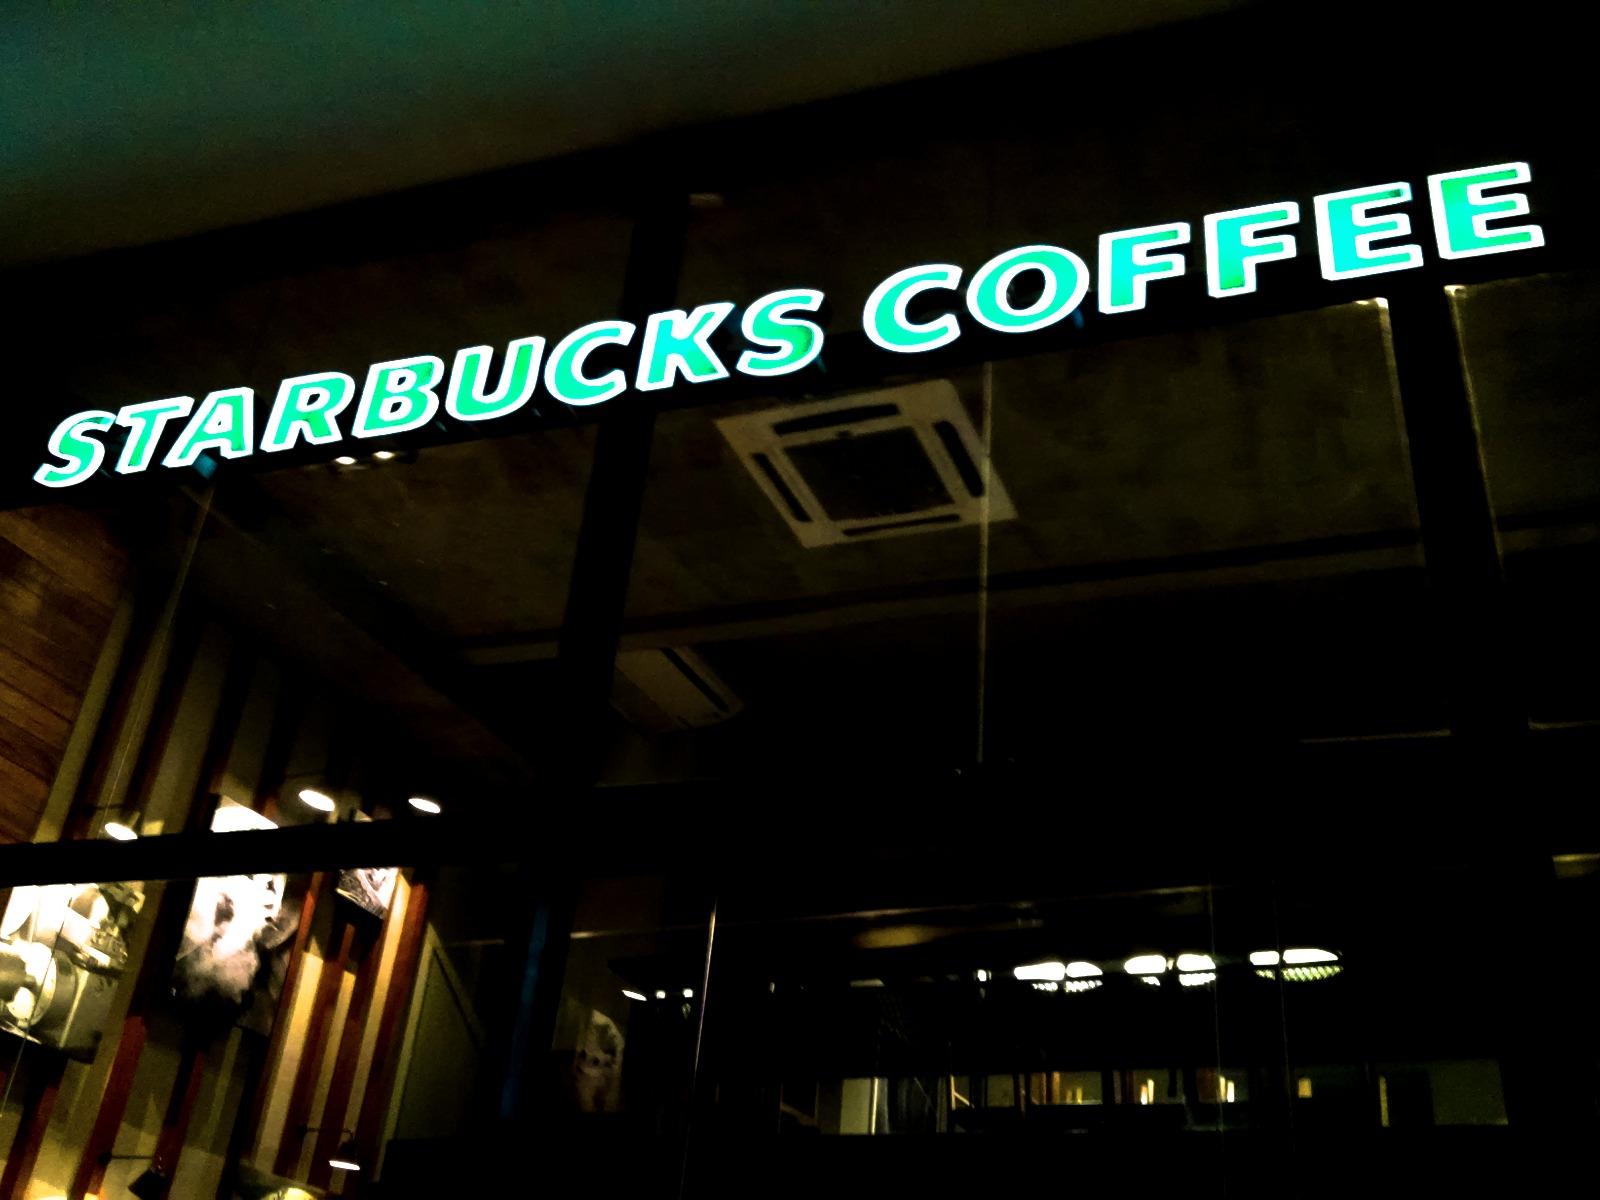 Starbucks Av Paulista, Starbucks Paulista, Starbucks  São Paulo, Starbucks , Starbucks Avenida Paulista, Starbucks  Jardins